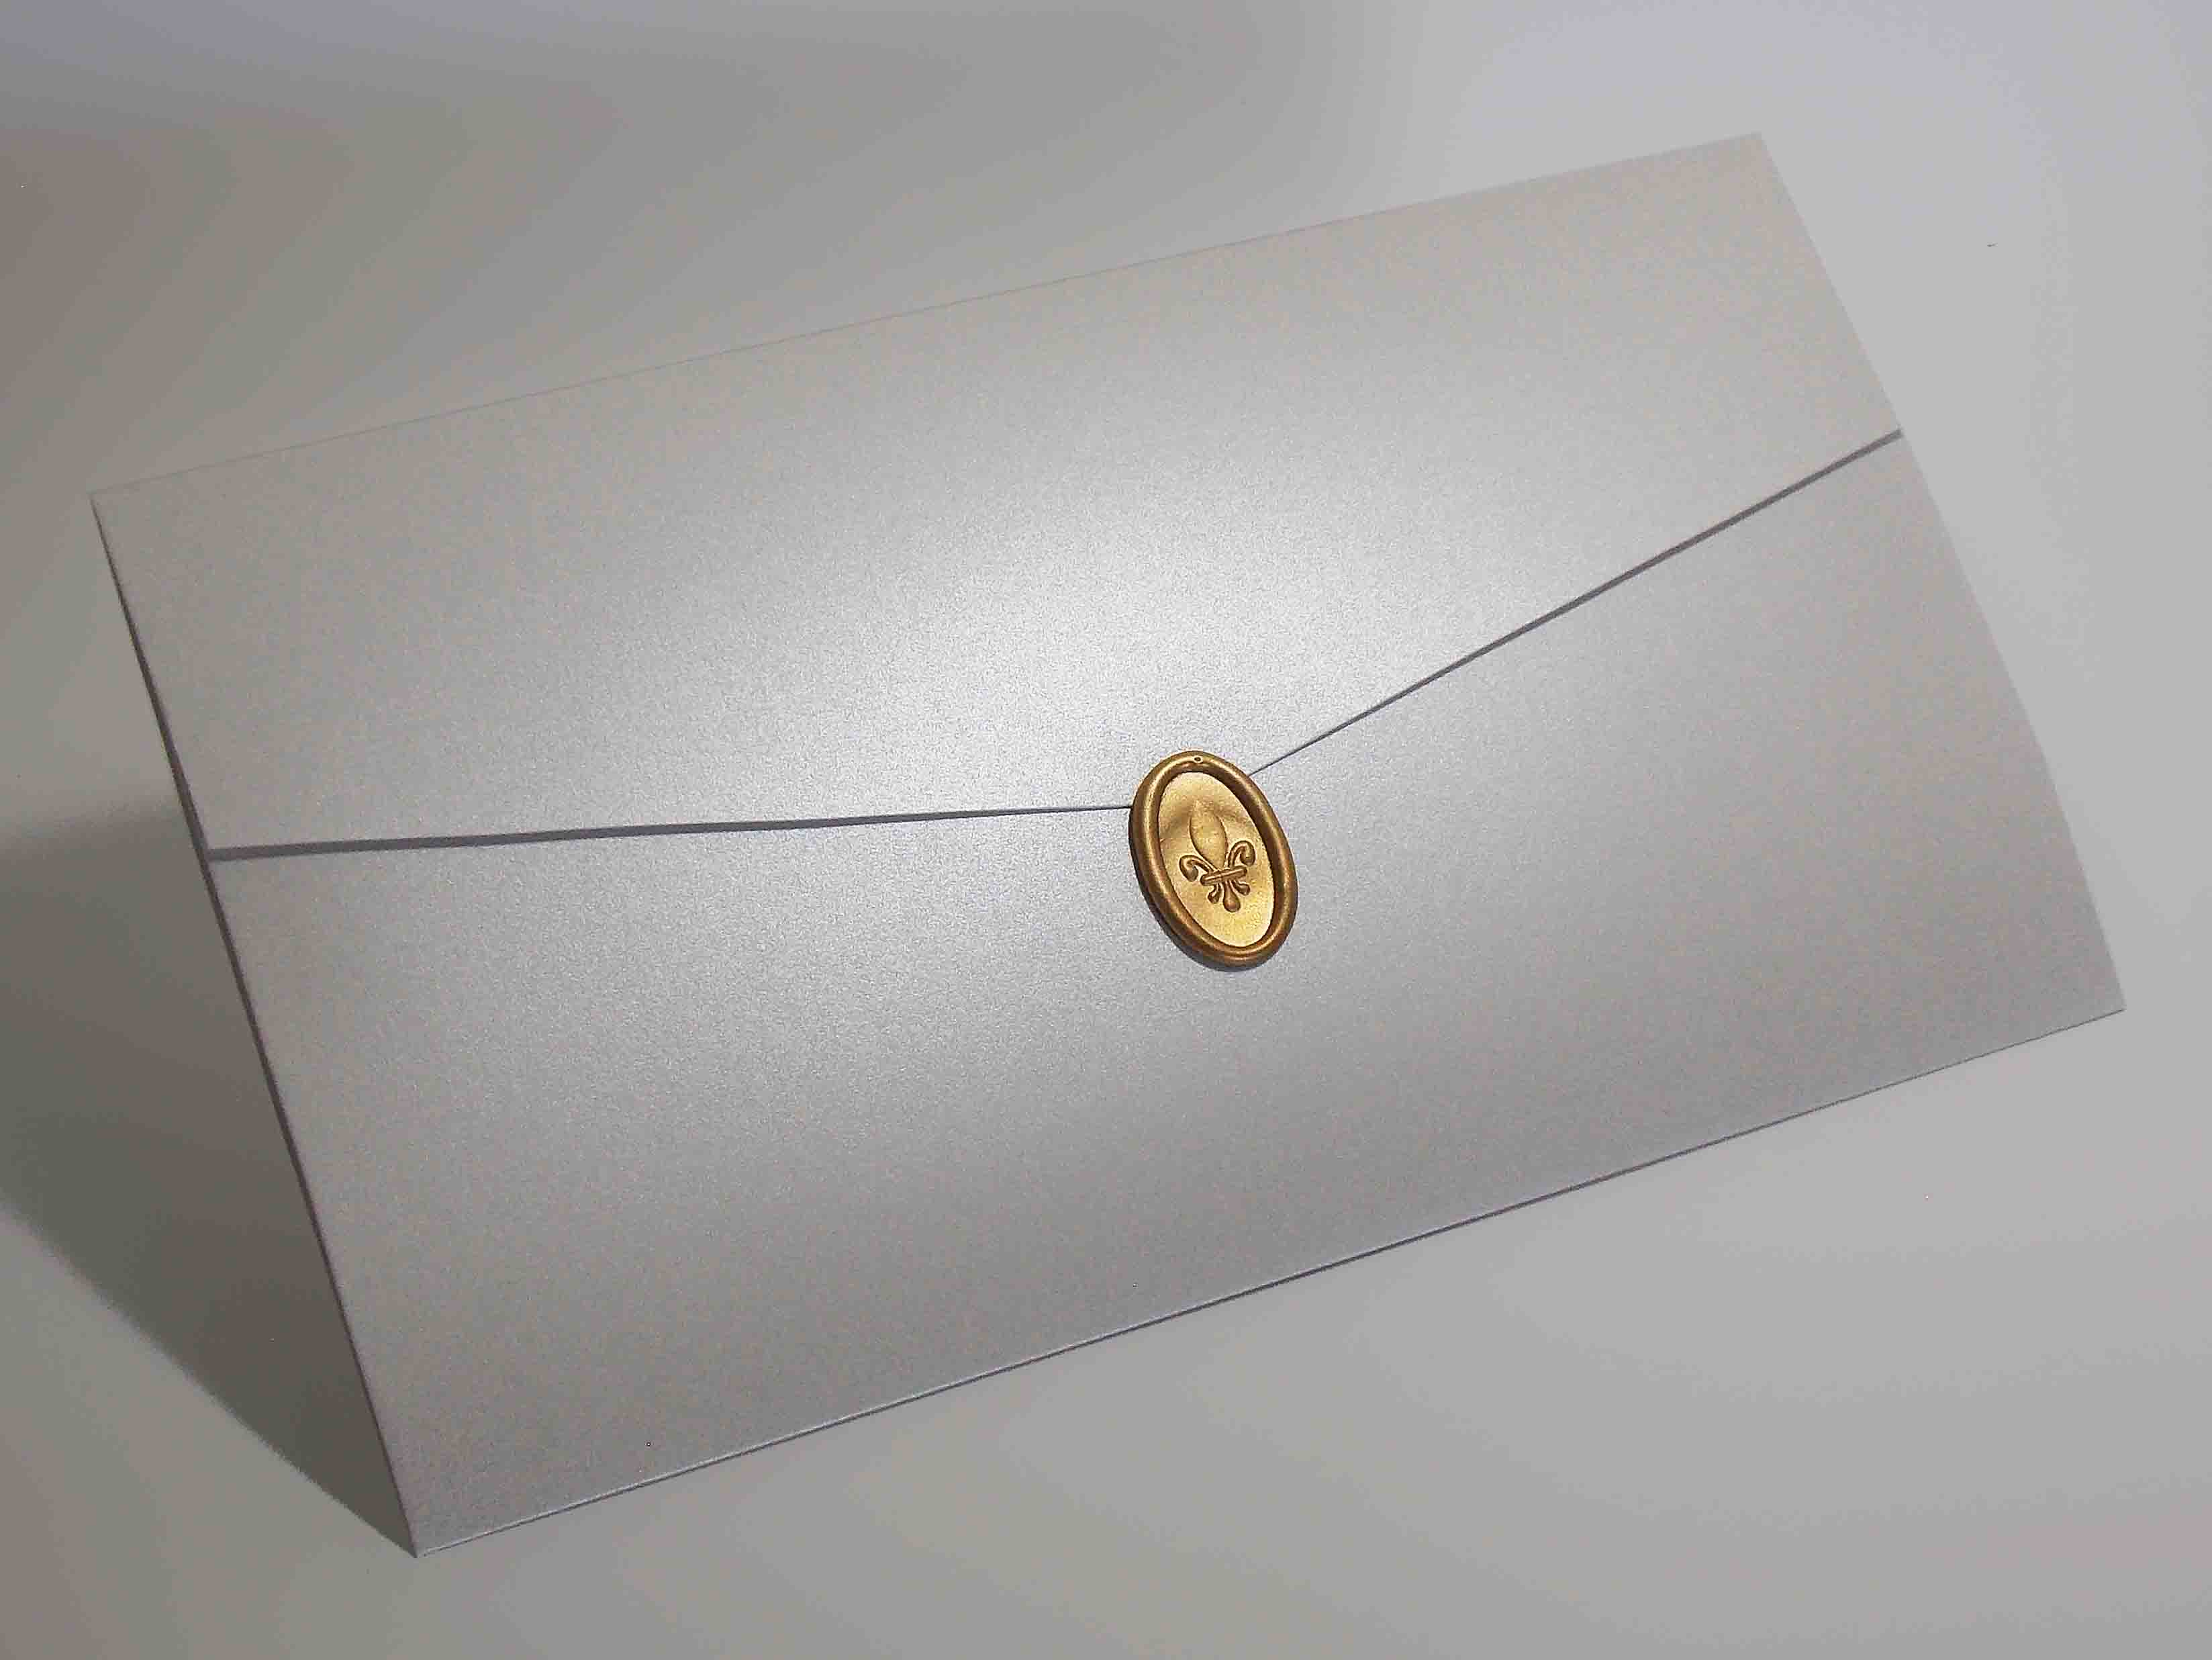 Convite de Casamento Envelope Bico com Lacre de Cera